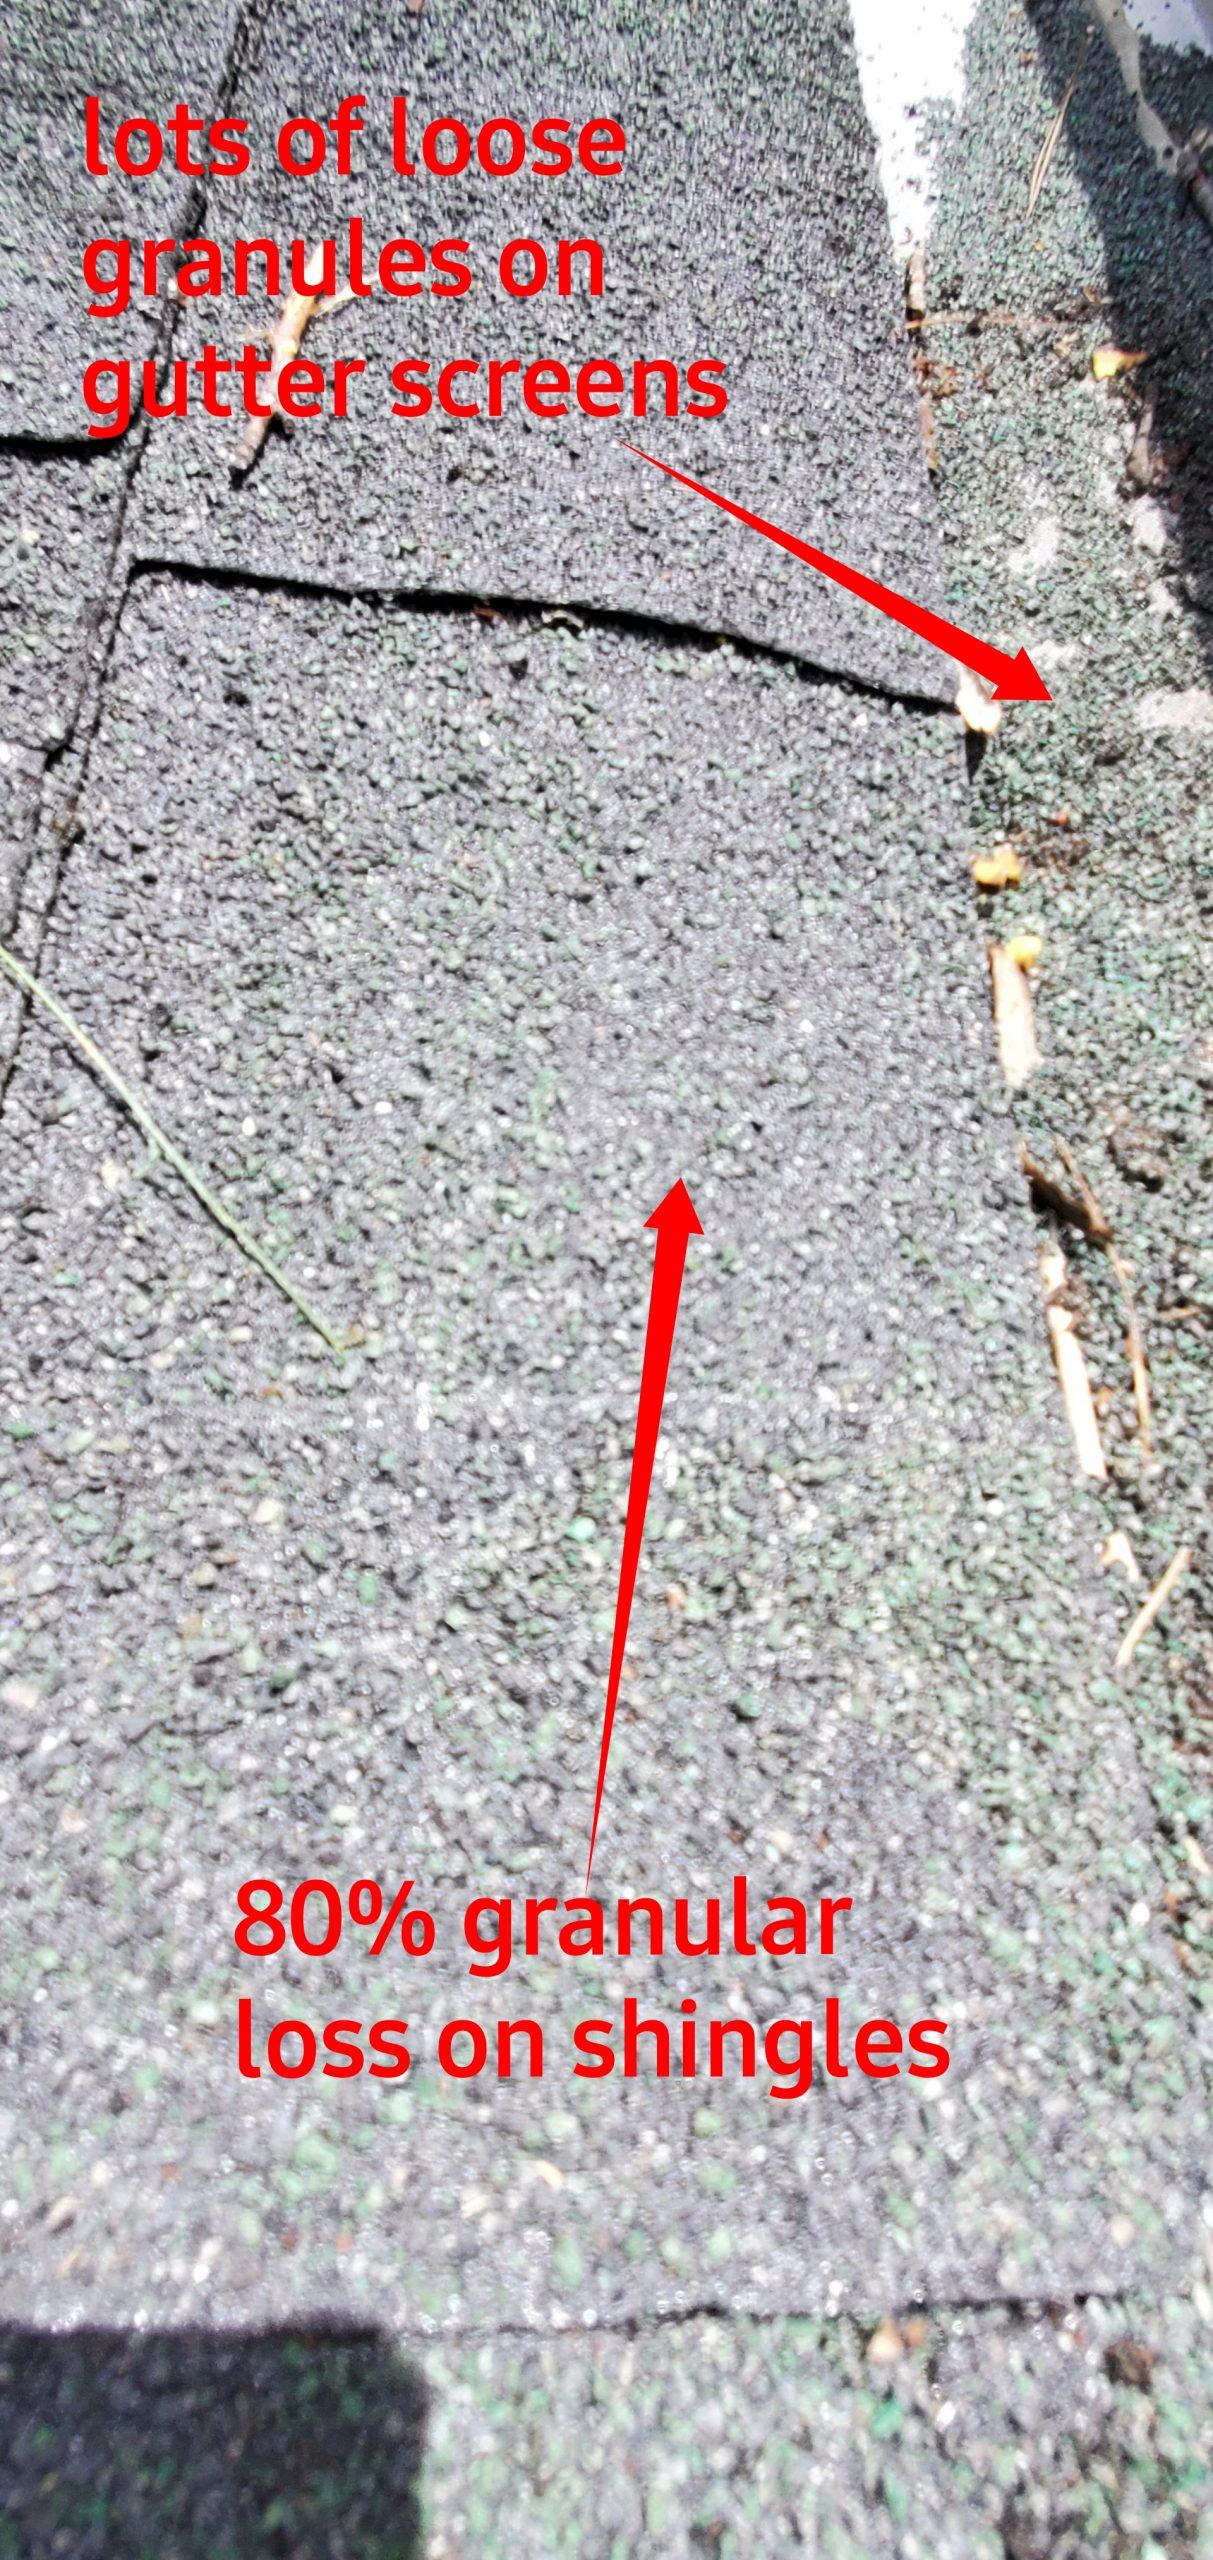 More signs of extreme granular loss